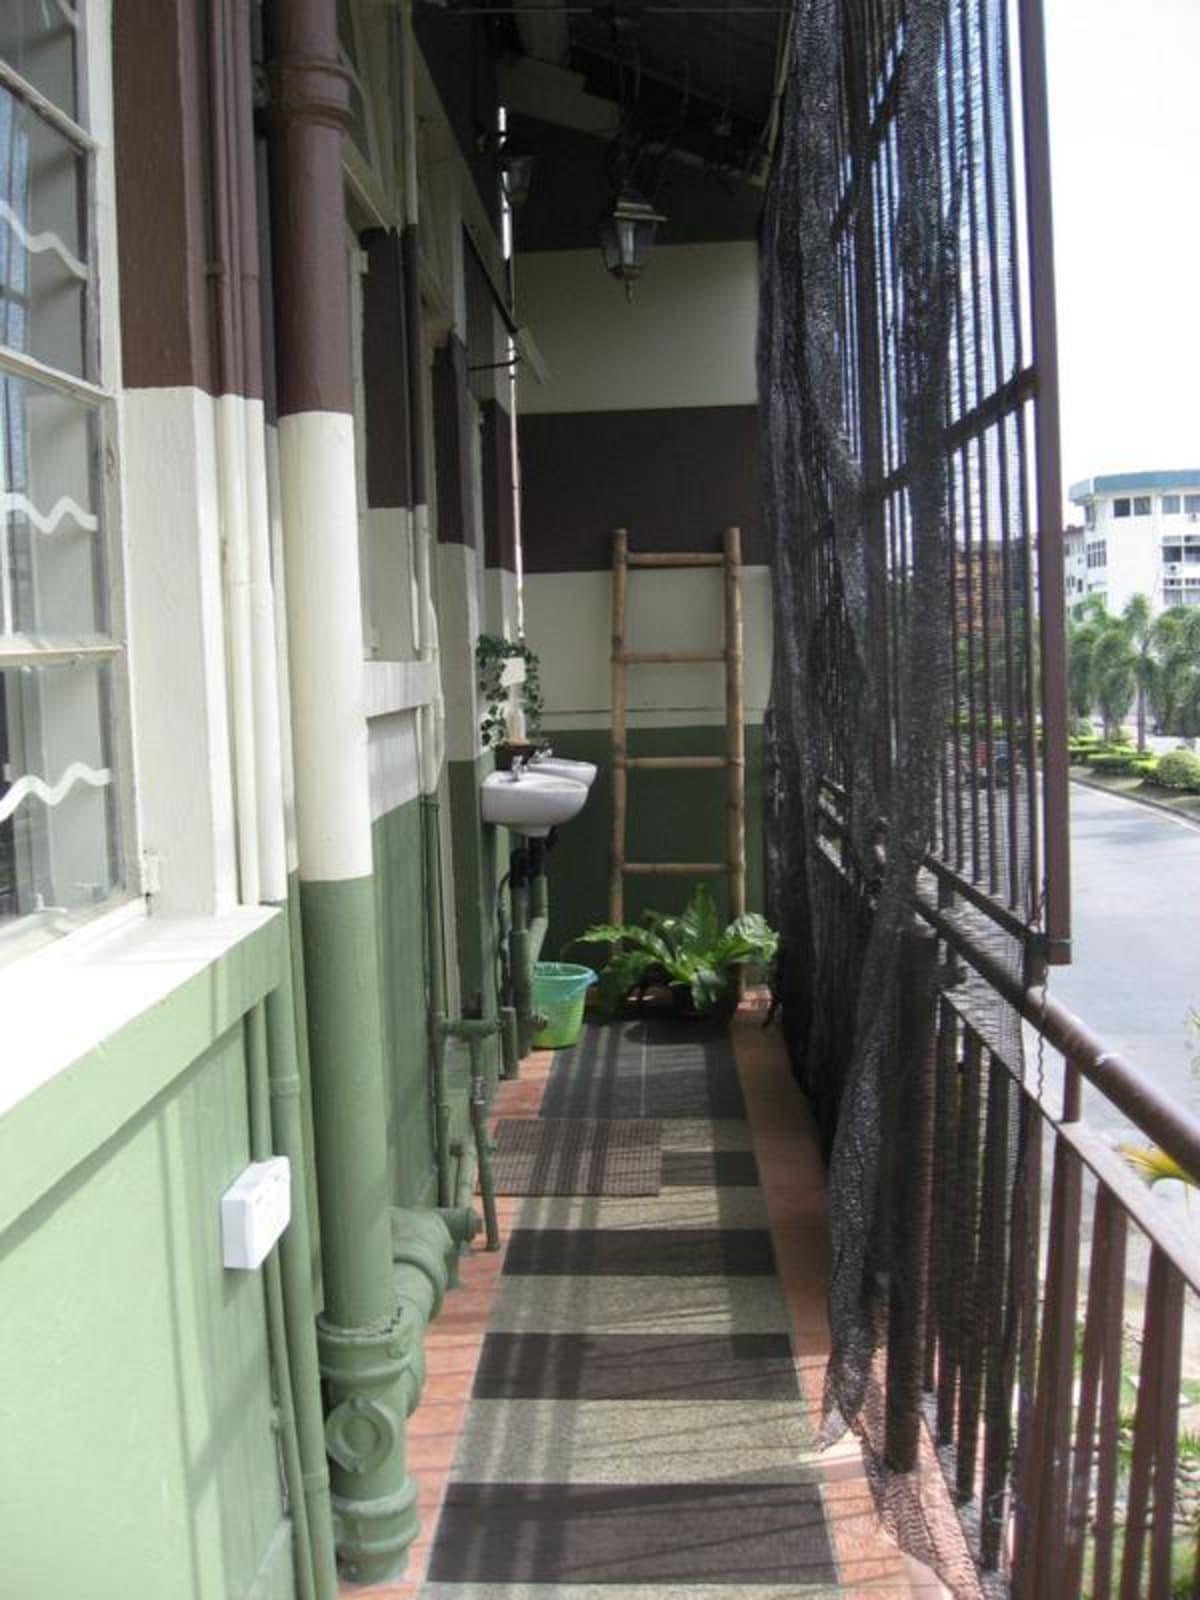 Borneo Backpackers, Kota Kinabalu, Malaysia hostel